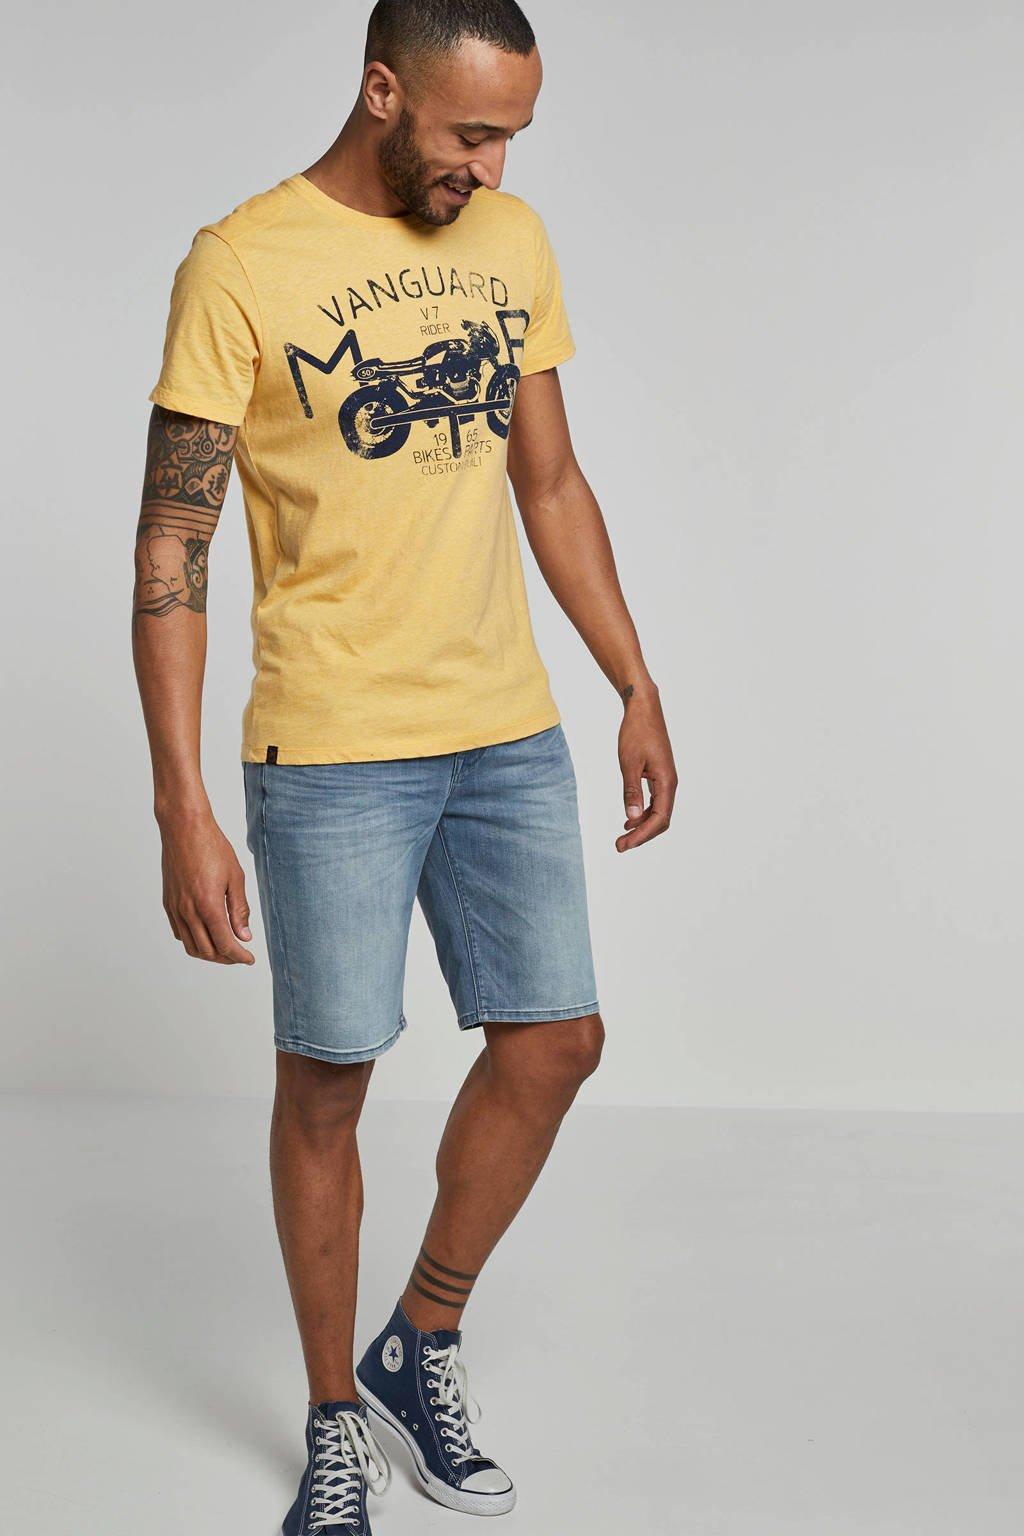 Vanguard slim fit Jeans short, Grijsblauw